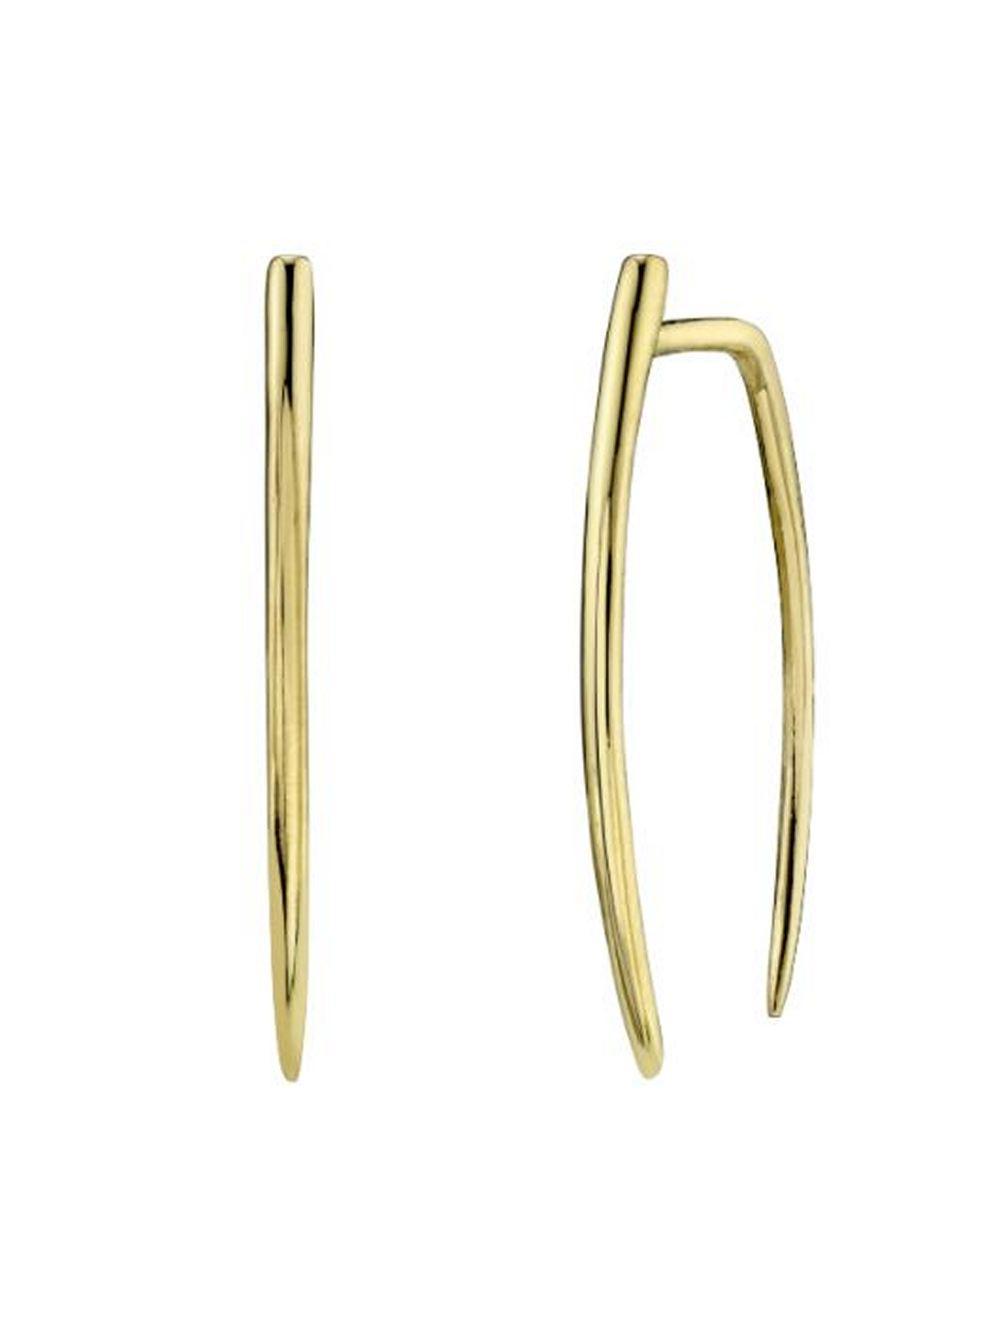 Large Infinite Tusk Earrings Item # E101-LRG